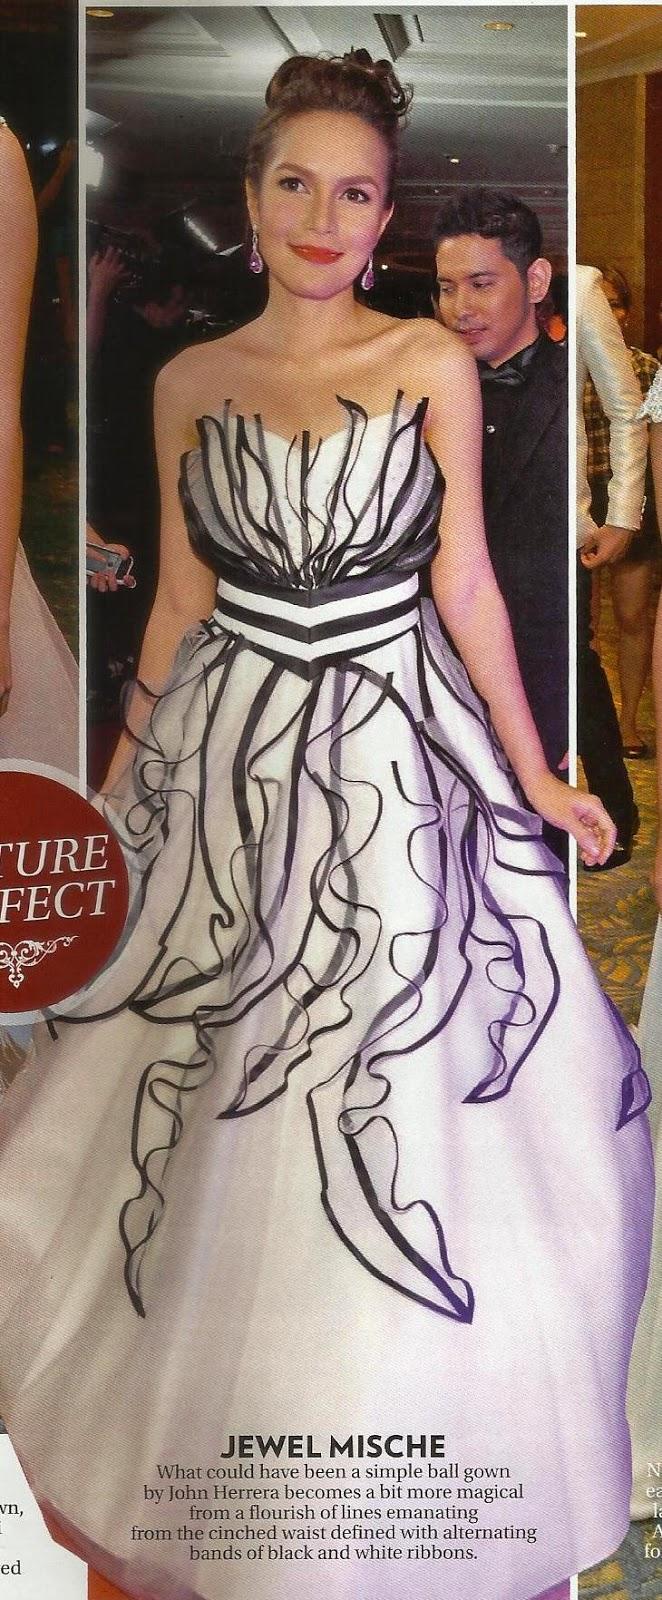 Kate Upton,Marianna Hill Hot image Penni Gray,Aimi MacDonald